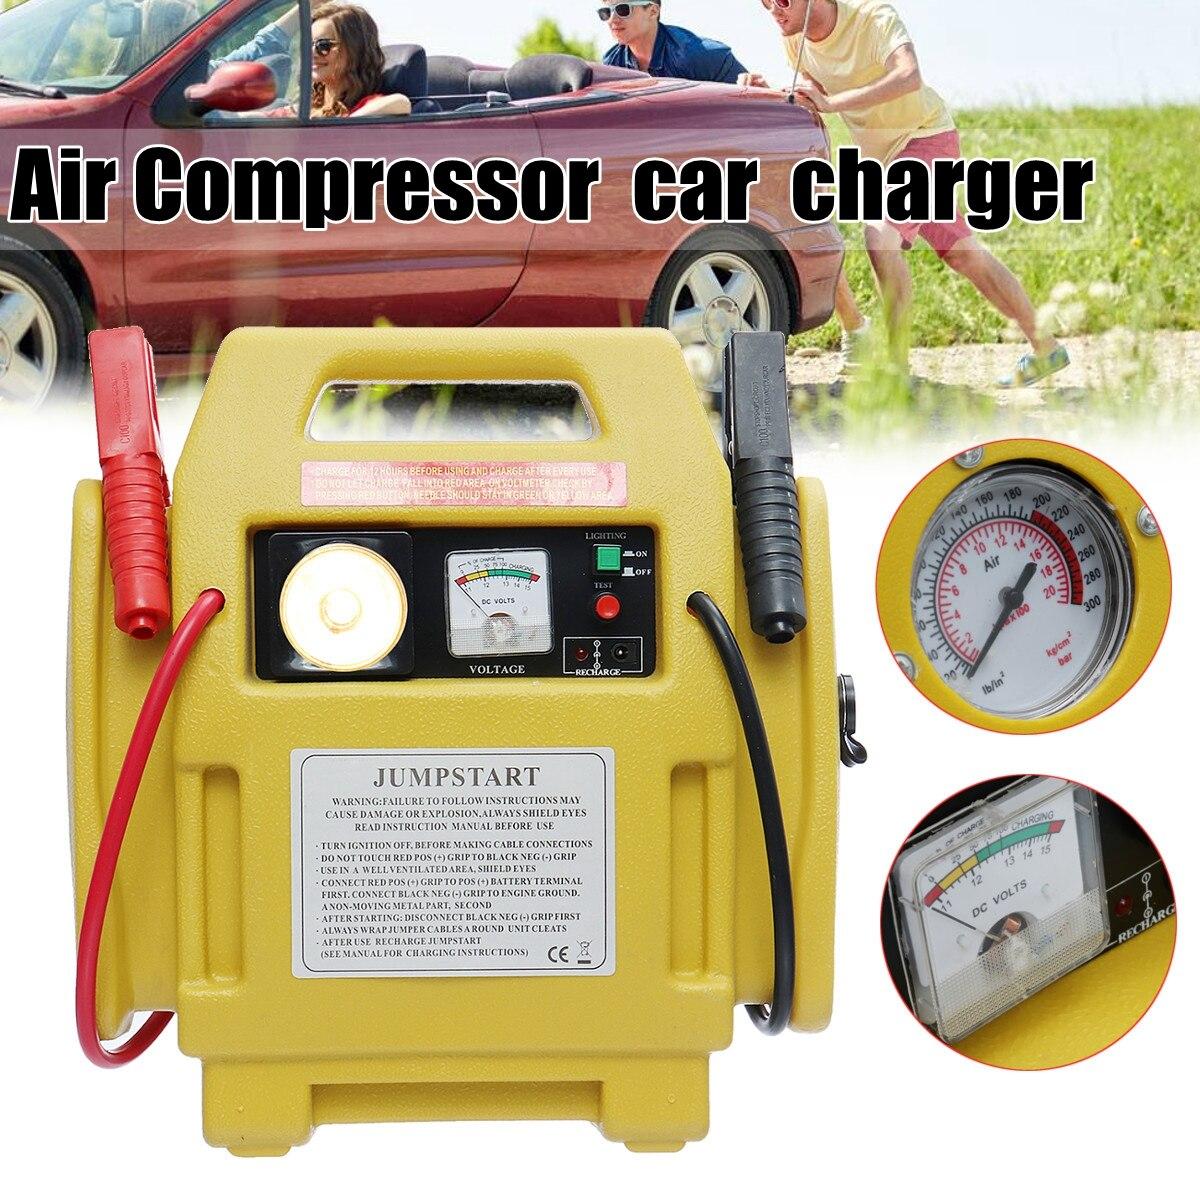 24v 26600mah Portable Start Battery Usb Car Charger Booster Jump Short Circuit Protection Starter 12v Truck Leads Air Compressor